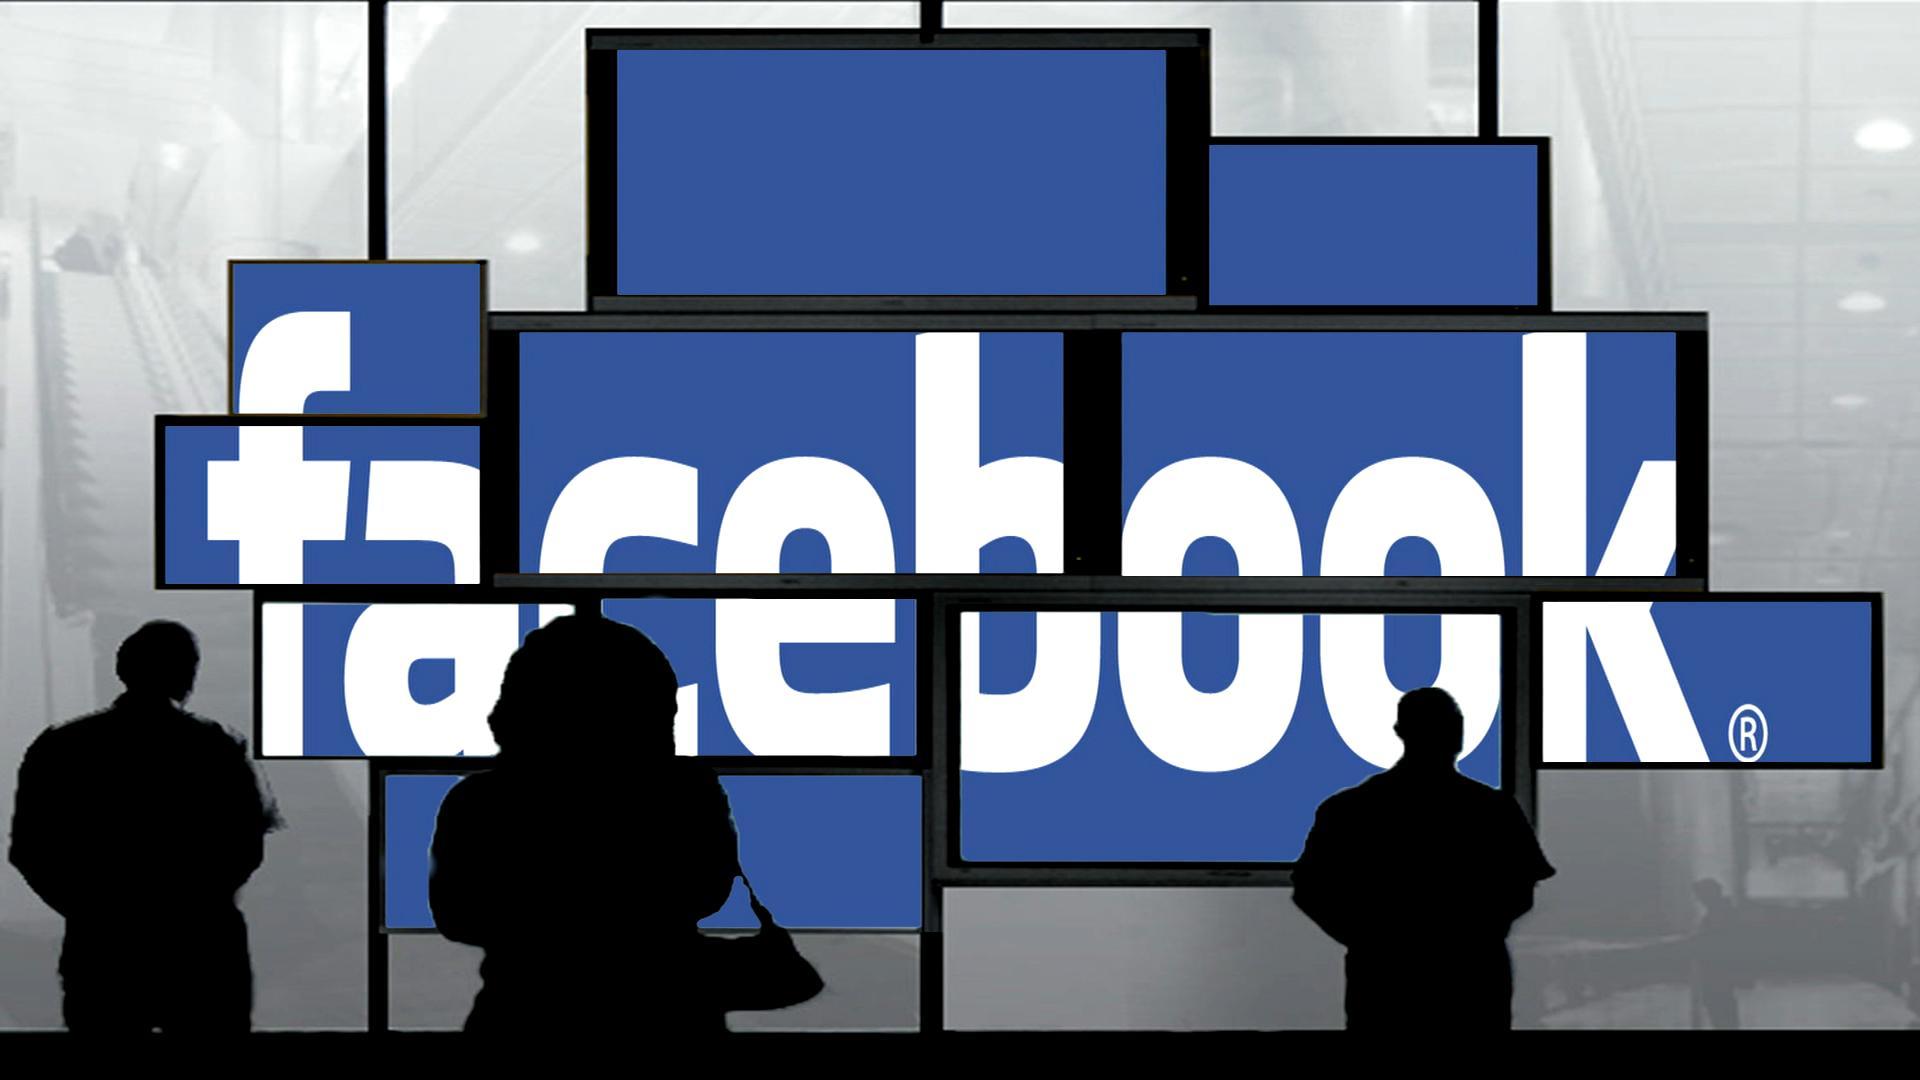 گزارش مالي فصل دوم 2021 فيسبوک منتشر شد